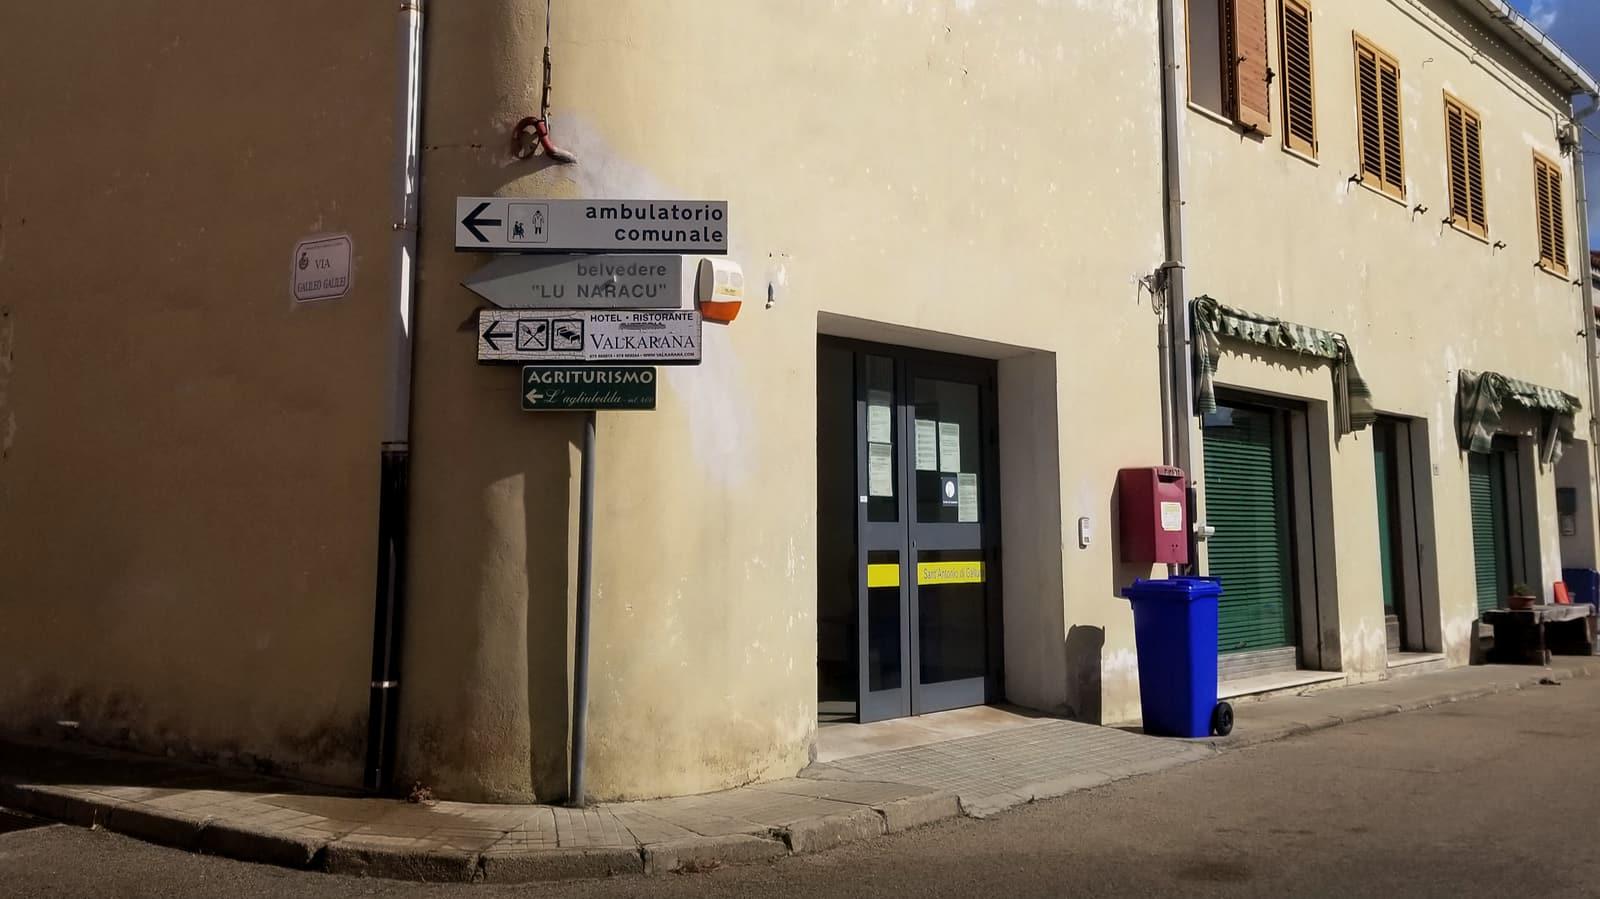 Ufficio postale Sant'Antonio Gallura